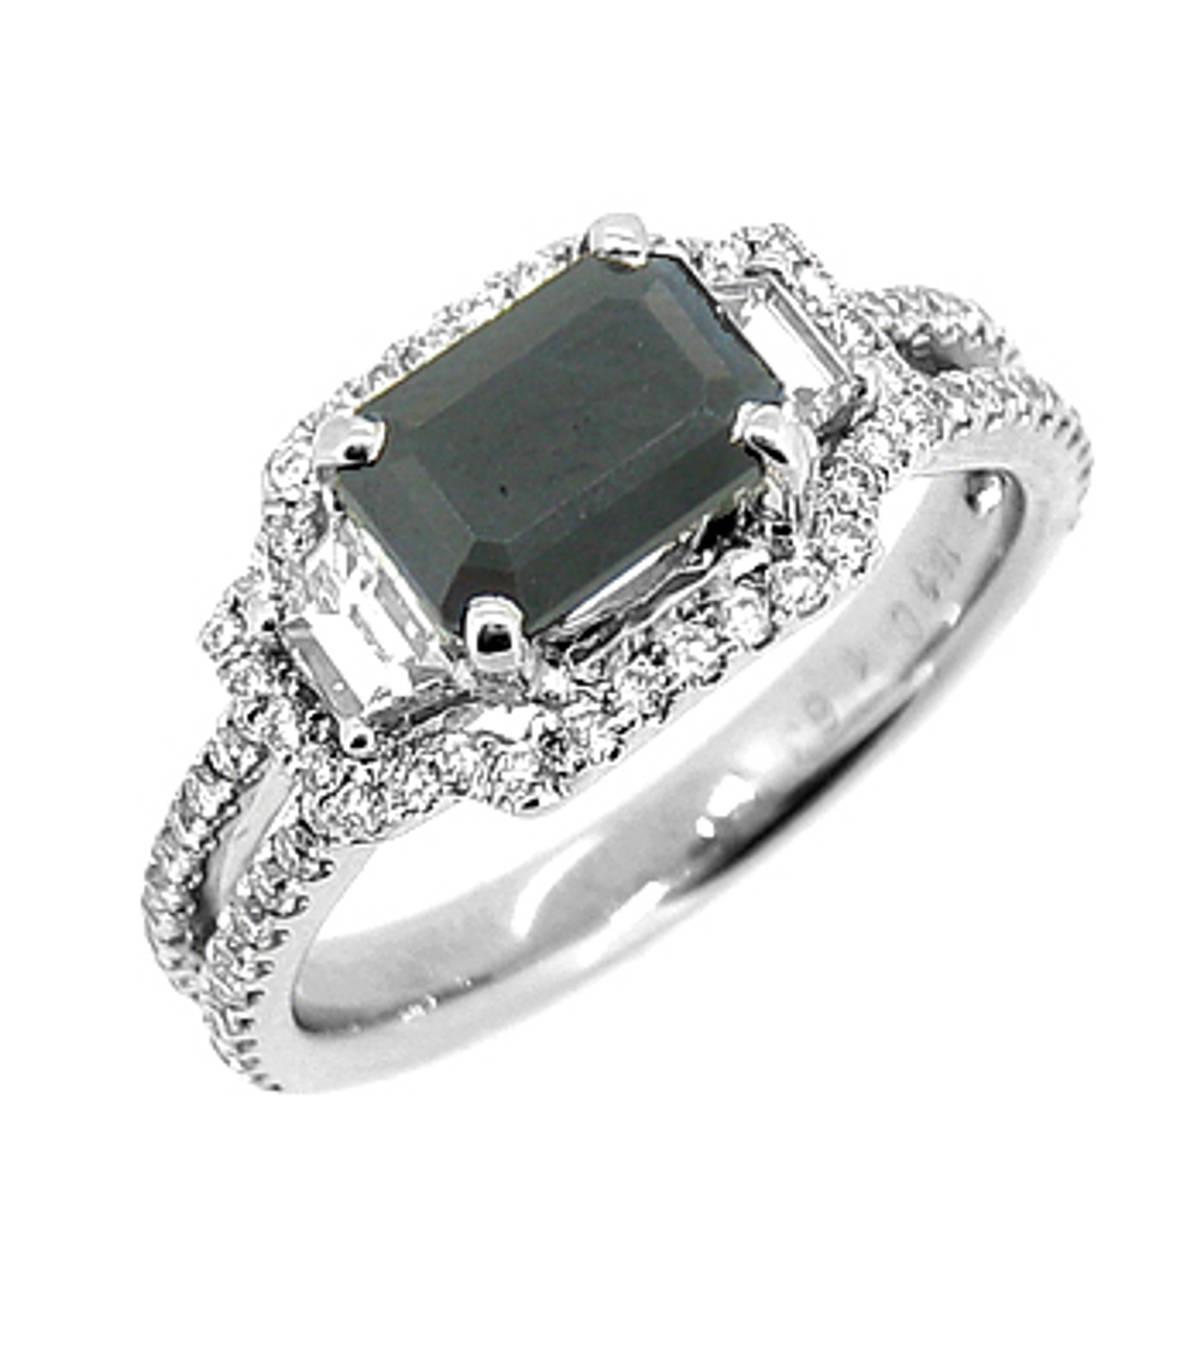 Dark sapphire and diamond cluster ringPictured item: sapphire: total 1.00ct/diamonds: total 0.78ct set in 18k white gold